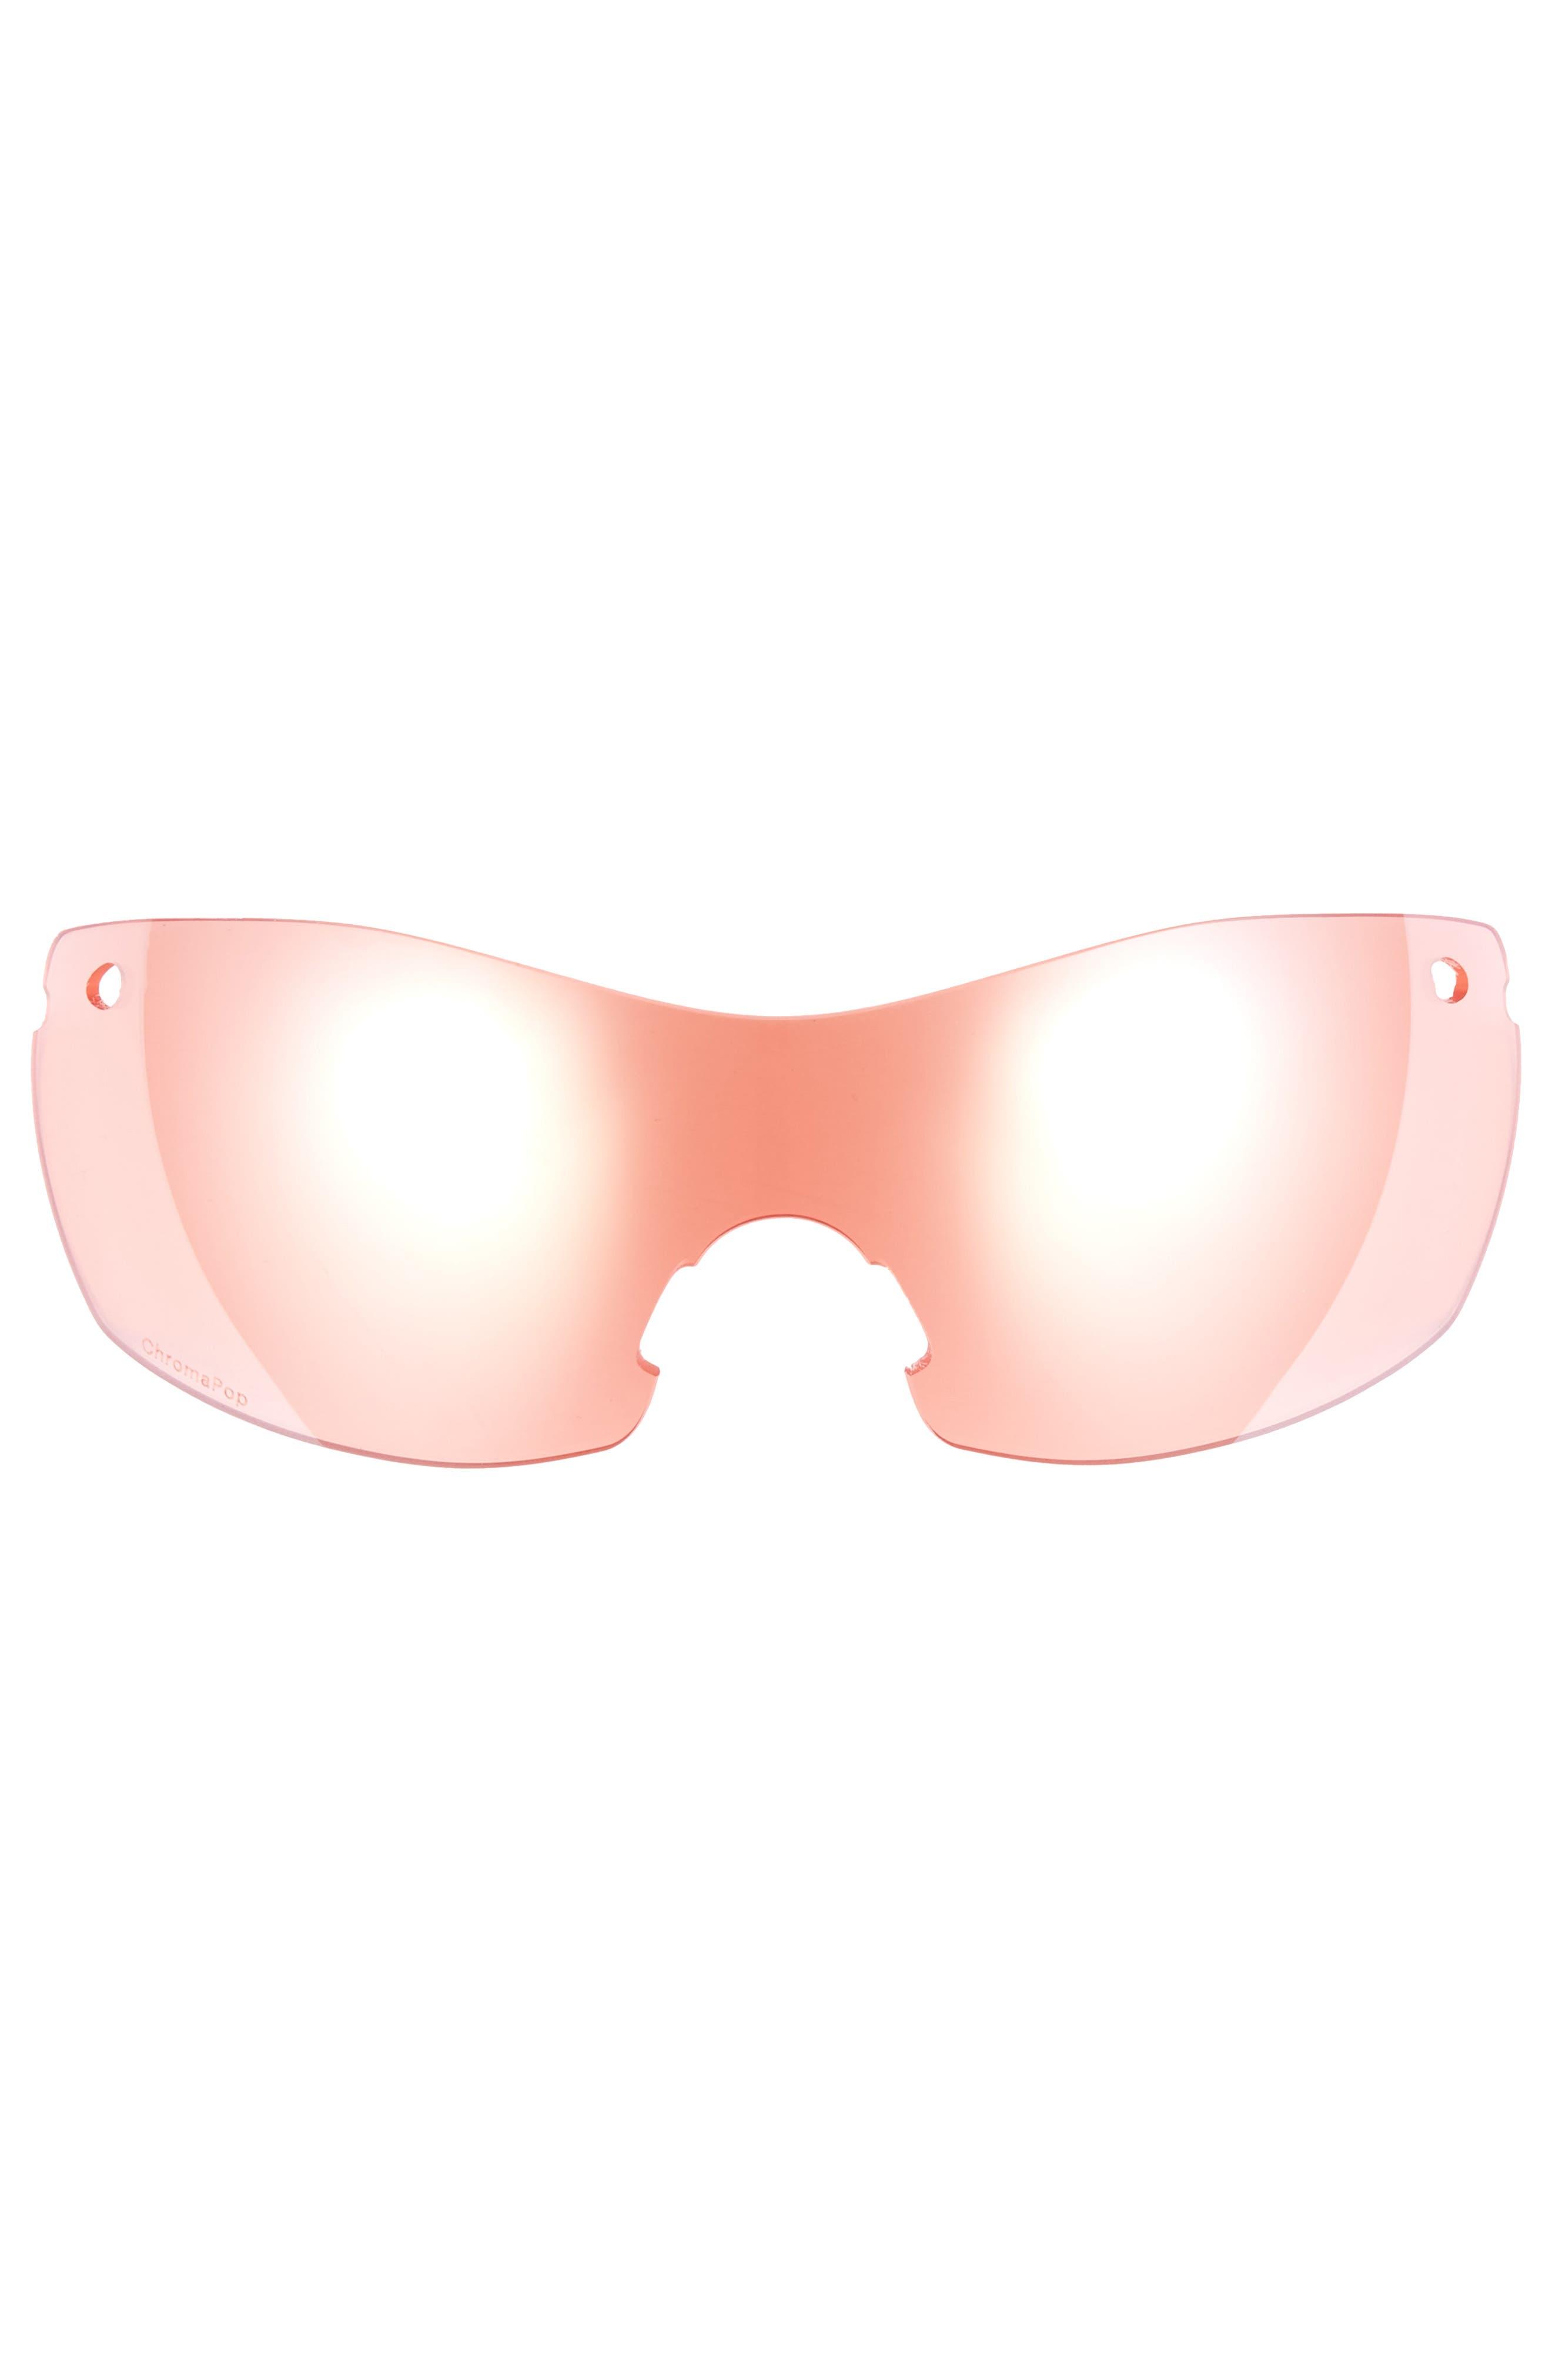 PivLock<sup>™</sup> Asana 150mm ChromaPop Polarized Sunglasses,                             Alternate thumbnail 4, color,                             Violet